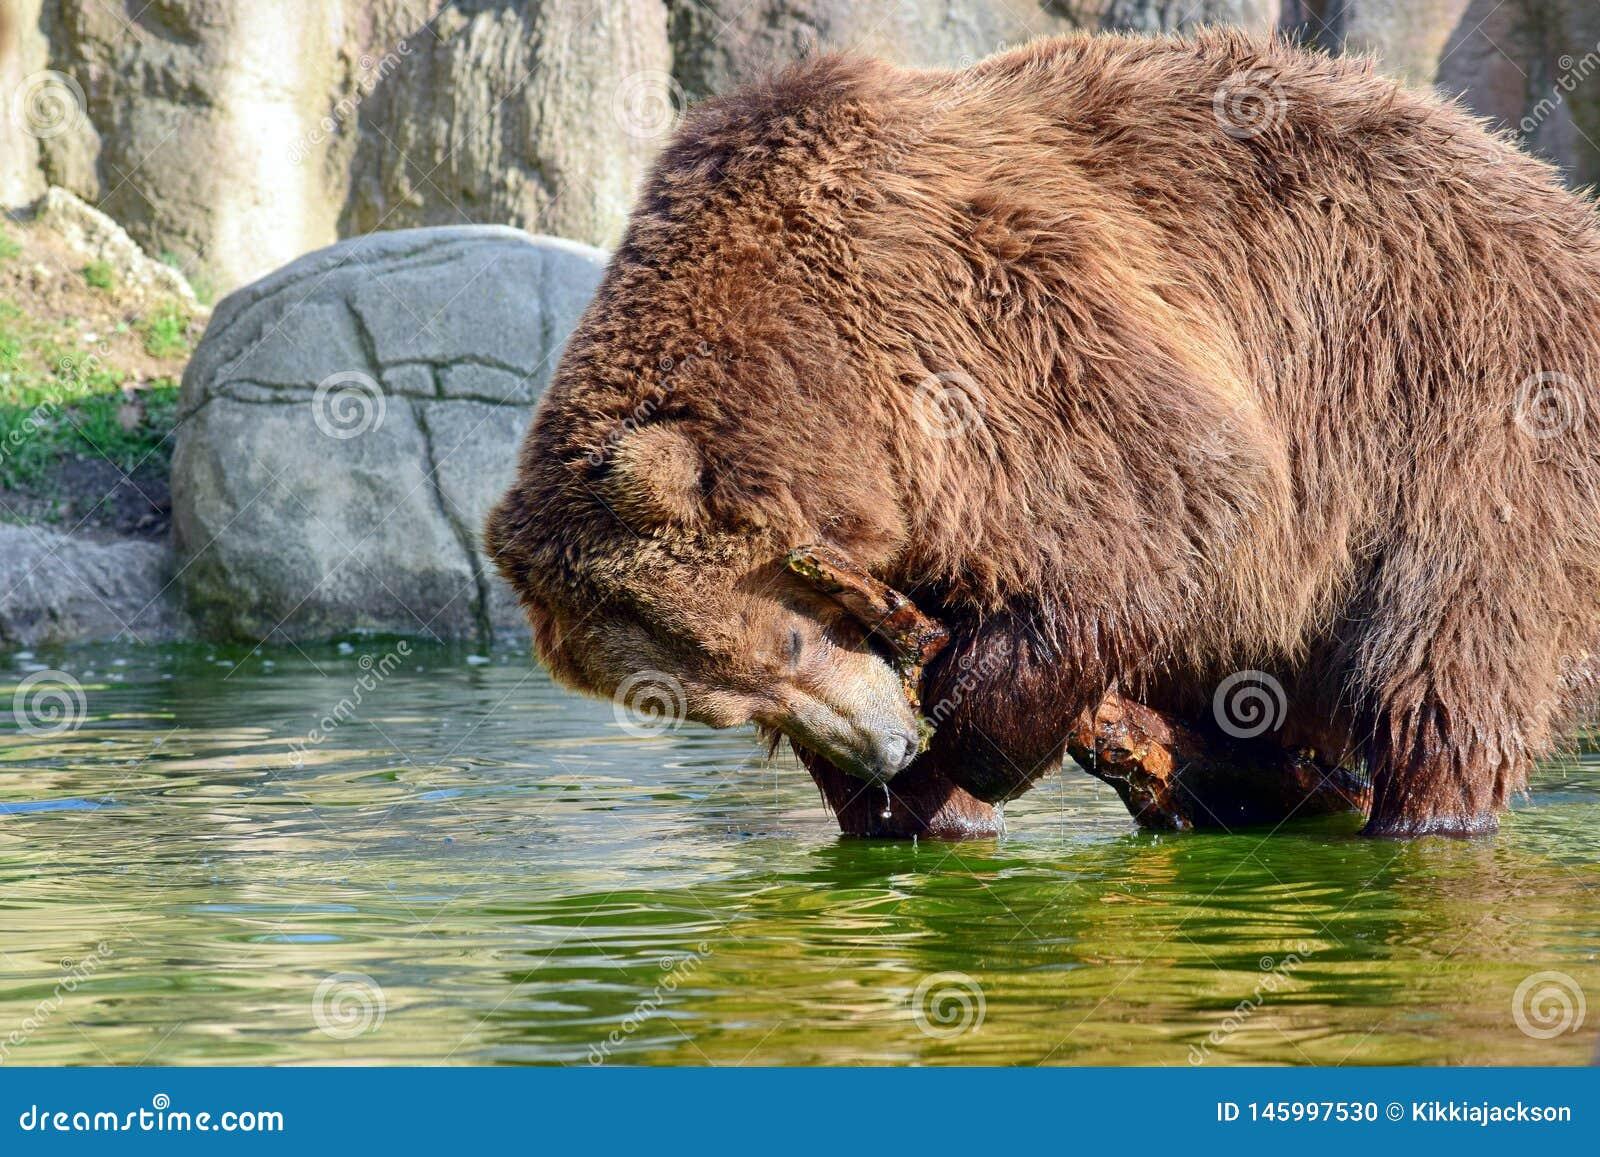 Brown Bear Ursus Arctos Beringianus Playing with Branxh in Water